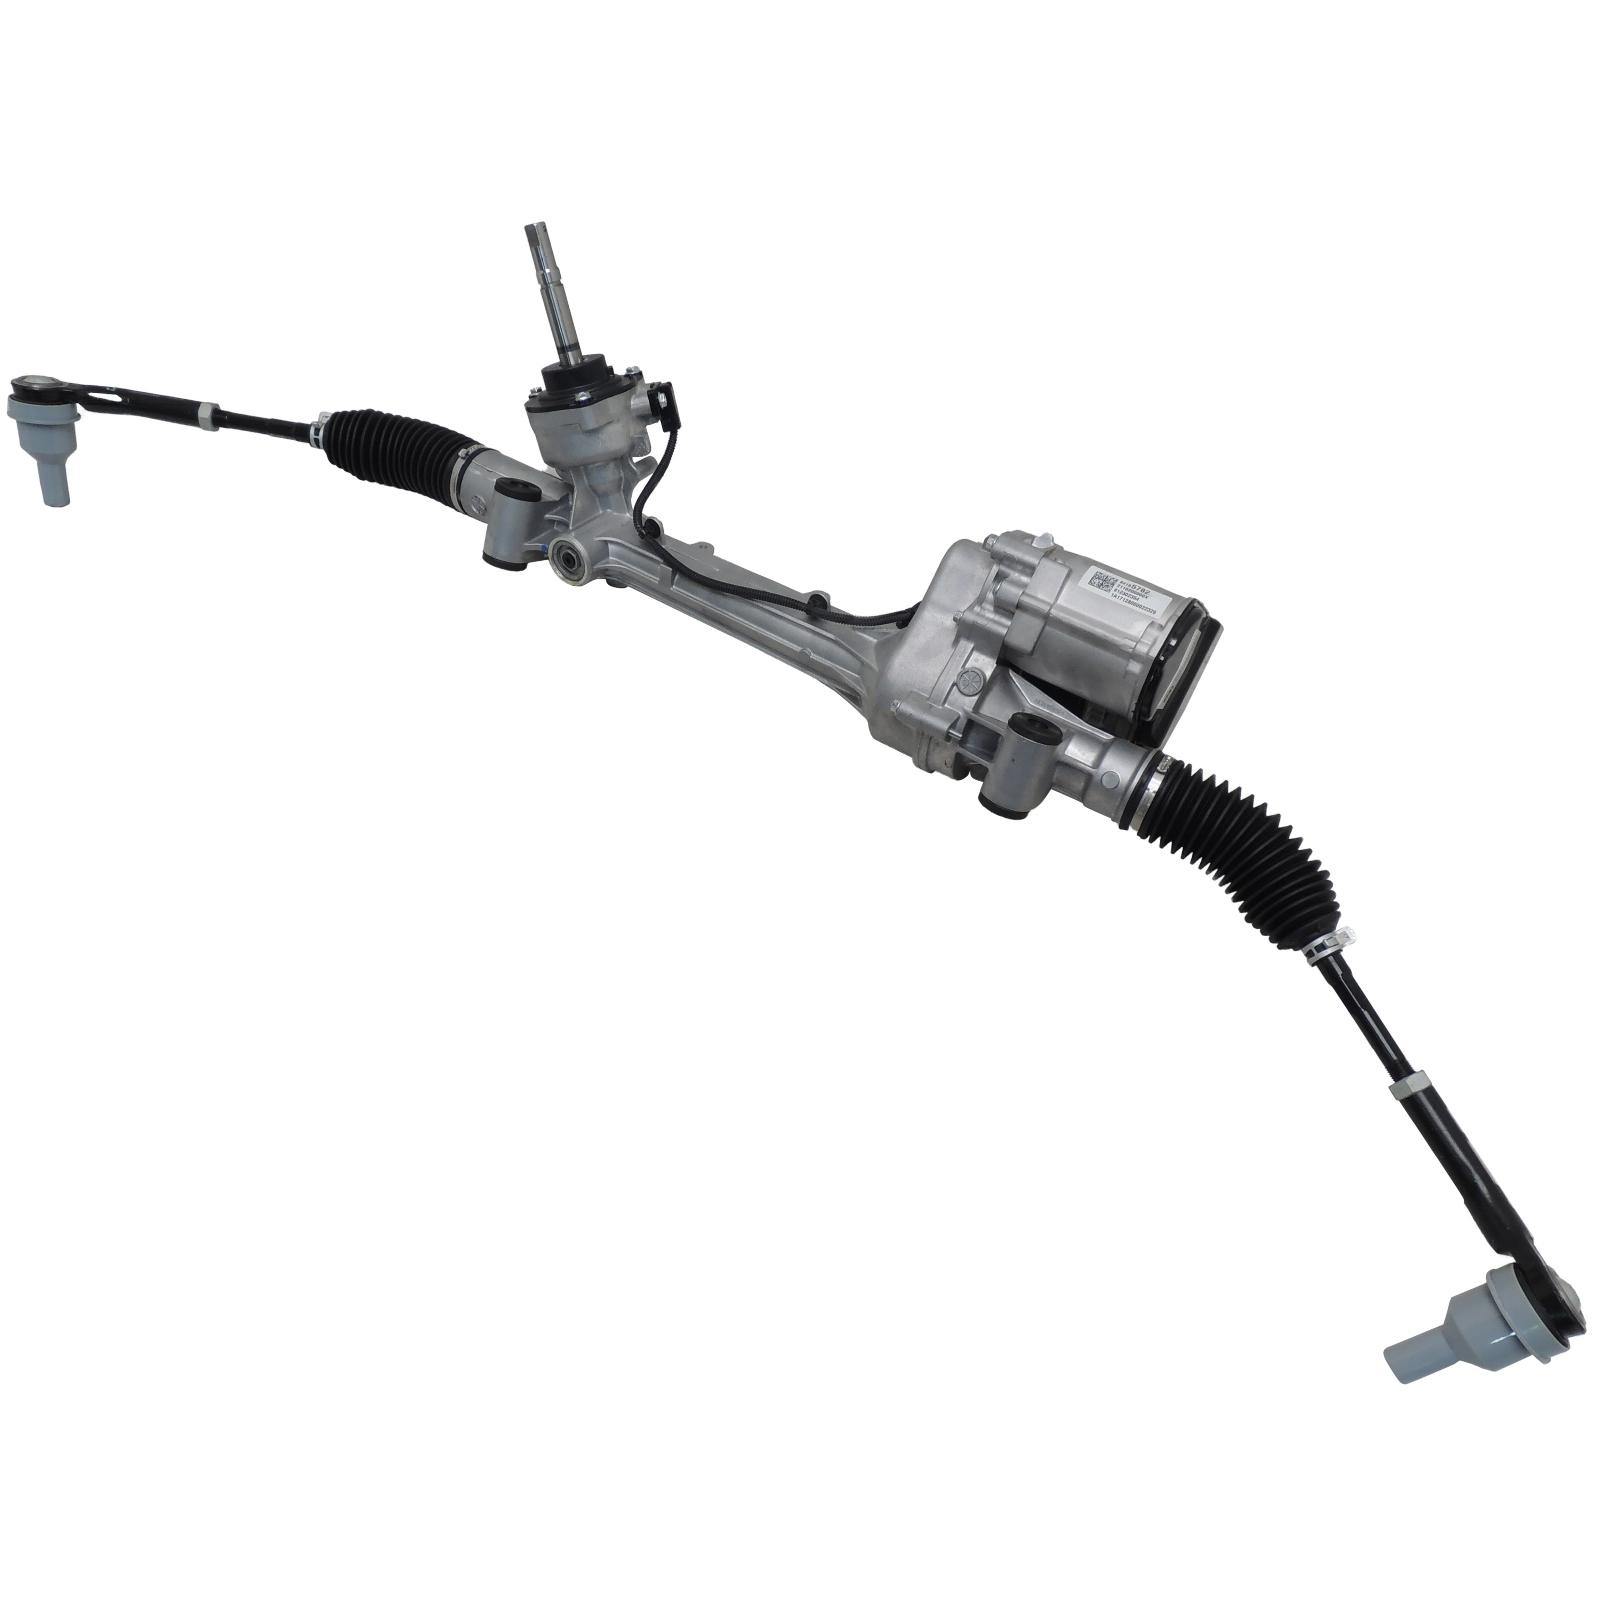 23242511 electric steering gear rack \u0026 pinion new oem gm 2014 1723242511 electric steering gear rack \u0026 pinion new oem gm 2014 17 buick regal awd